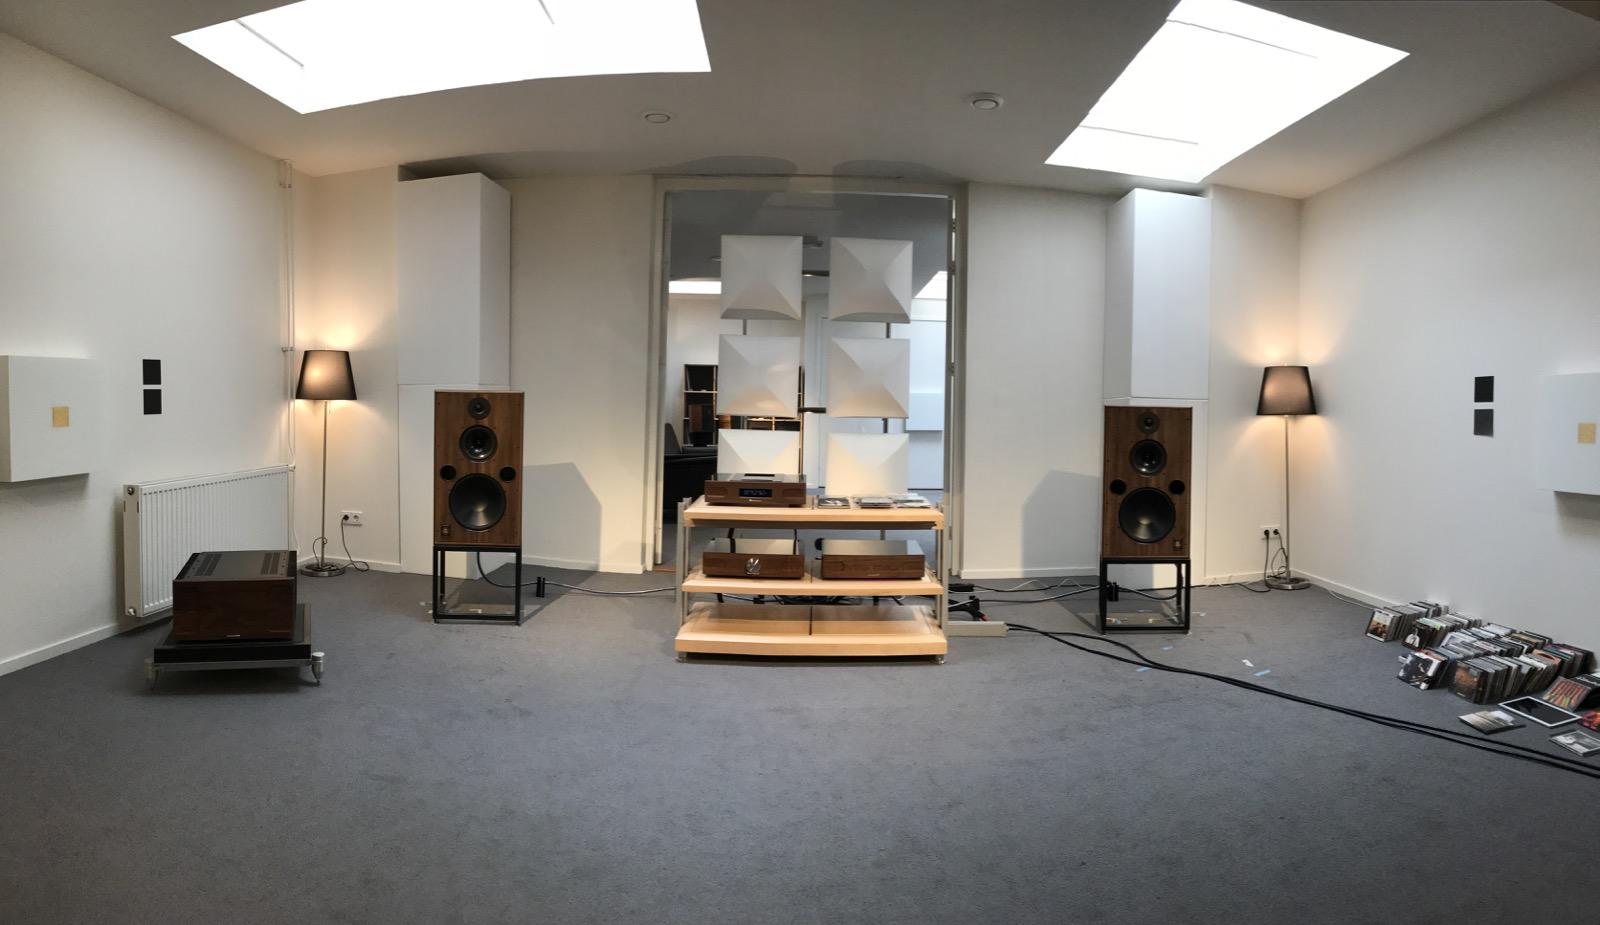 Verslag Harbeth road show Chattelin Audio Systems